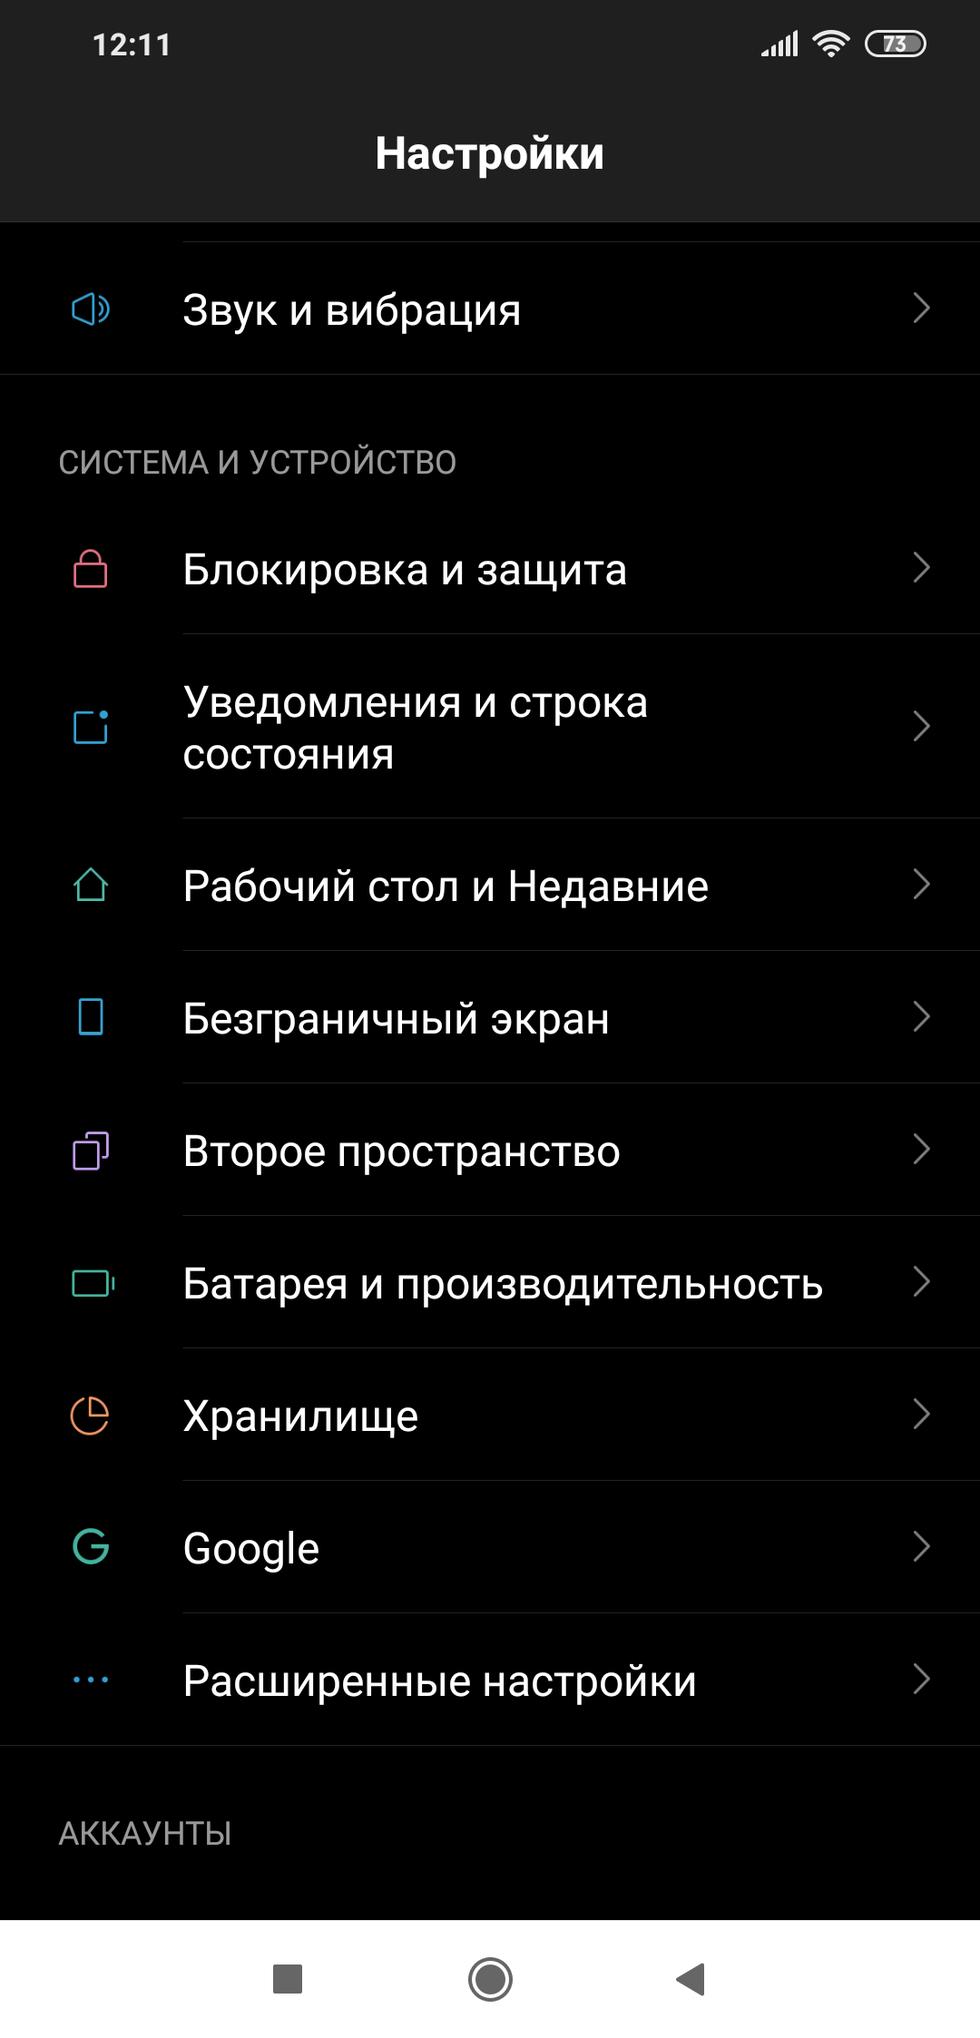 Screenshot_2019-01-12-12-11-31-221_com.android.settings.png